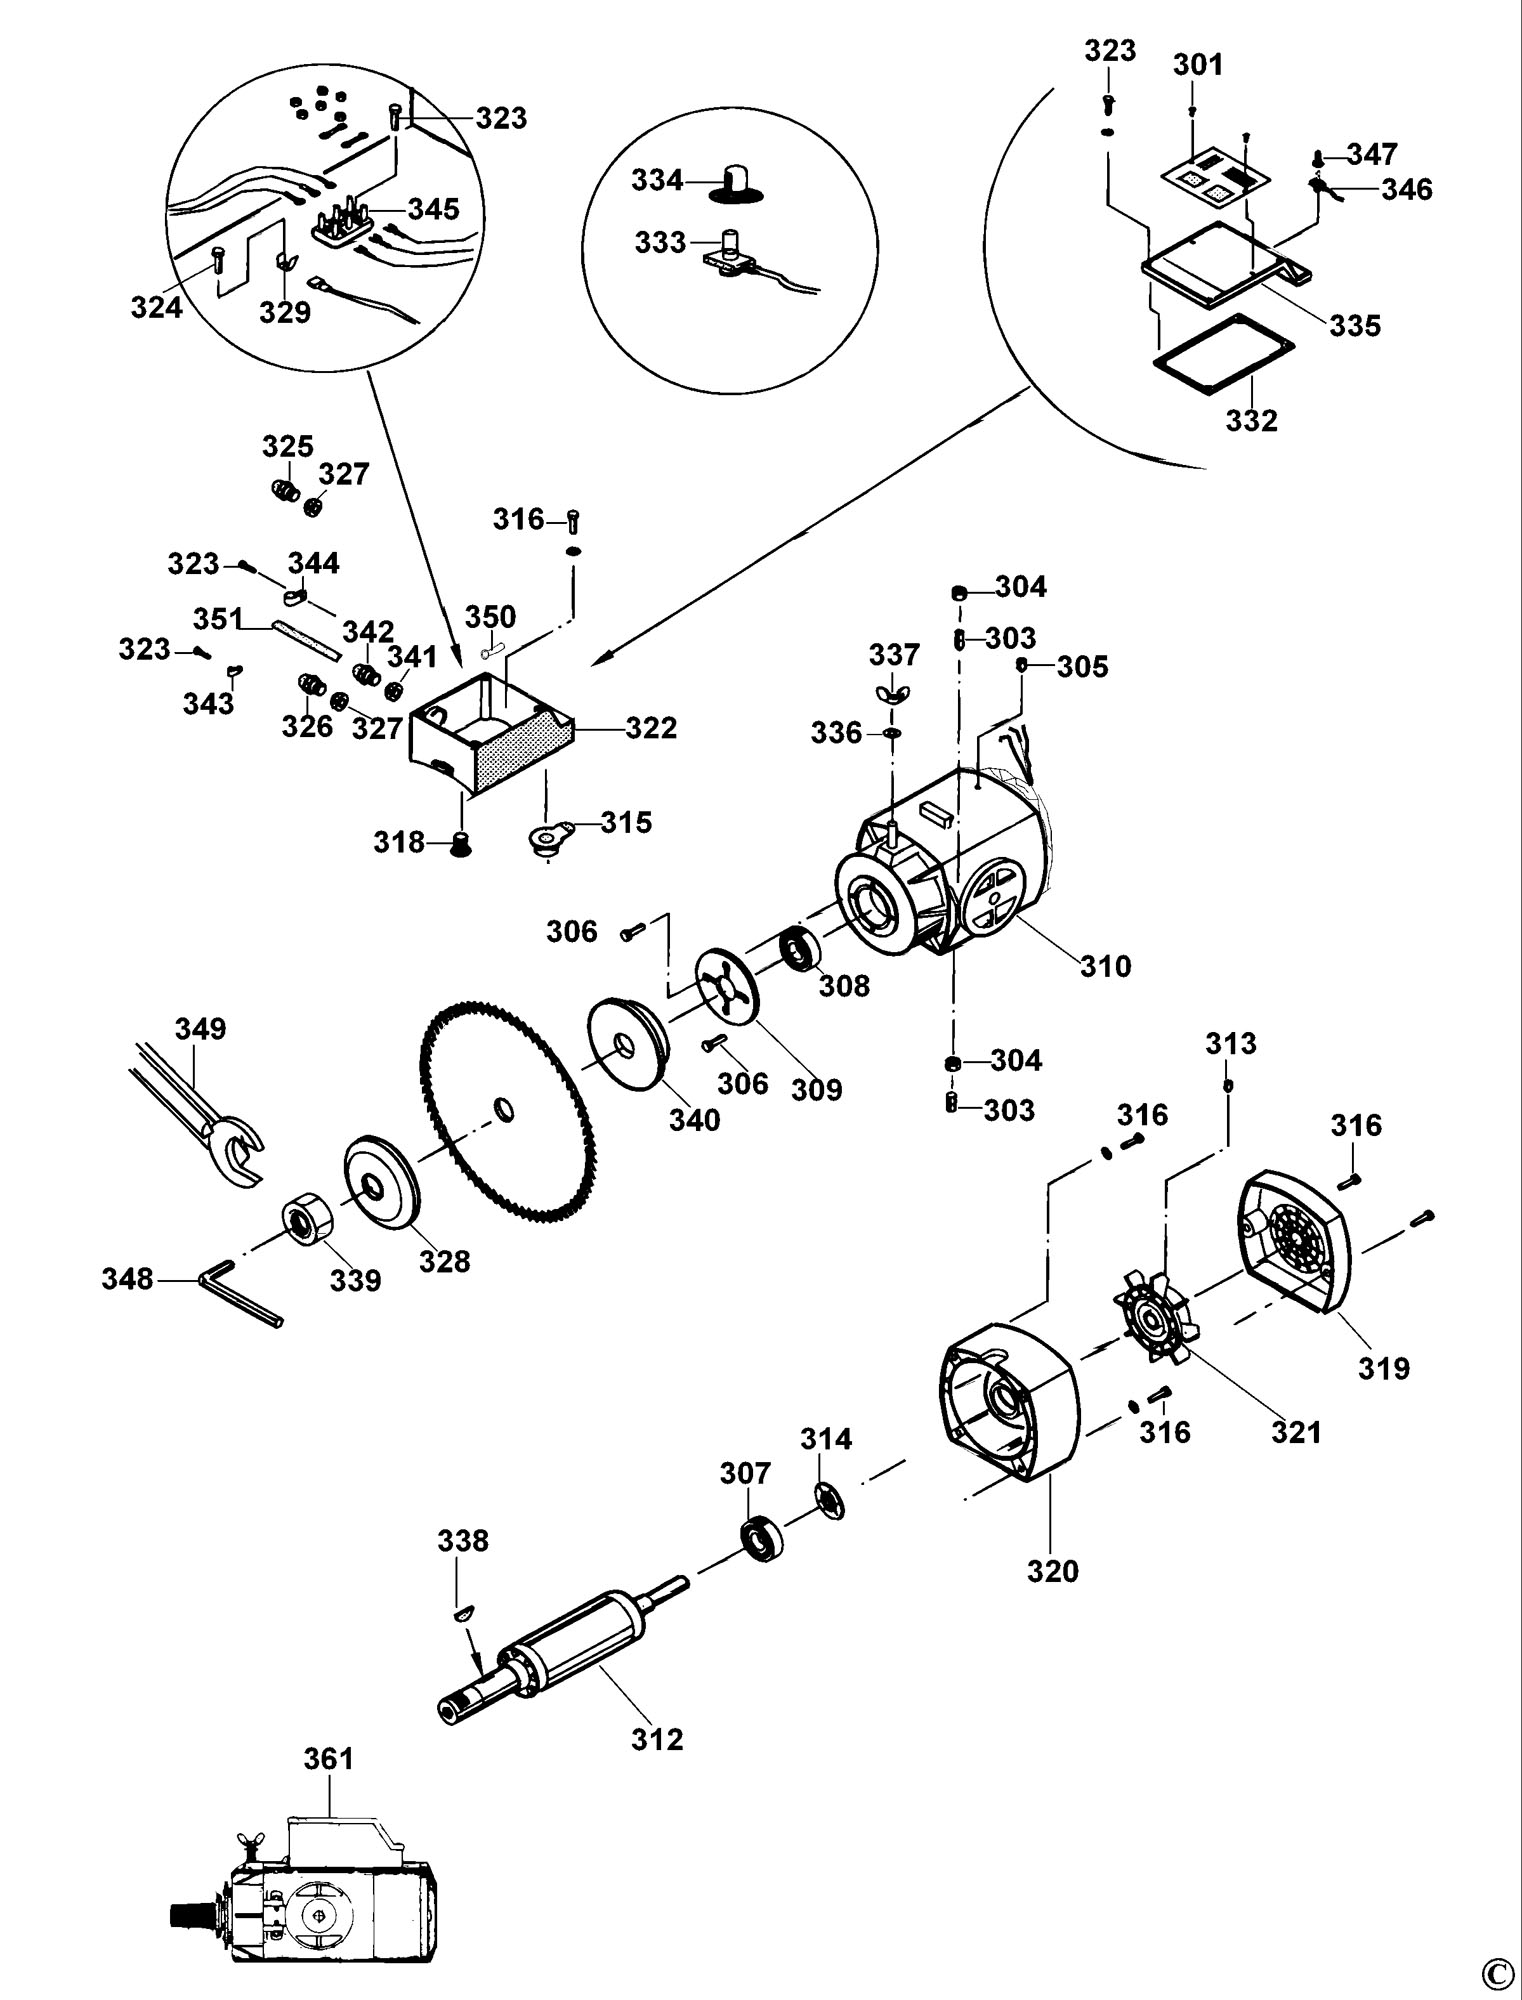 Spares for Dewalt Dw729 Radial Arm Saw (type 1) SPARE